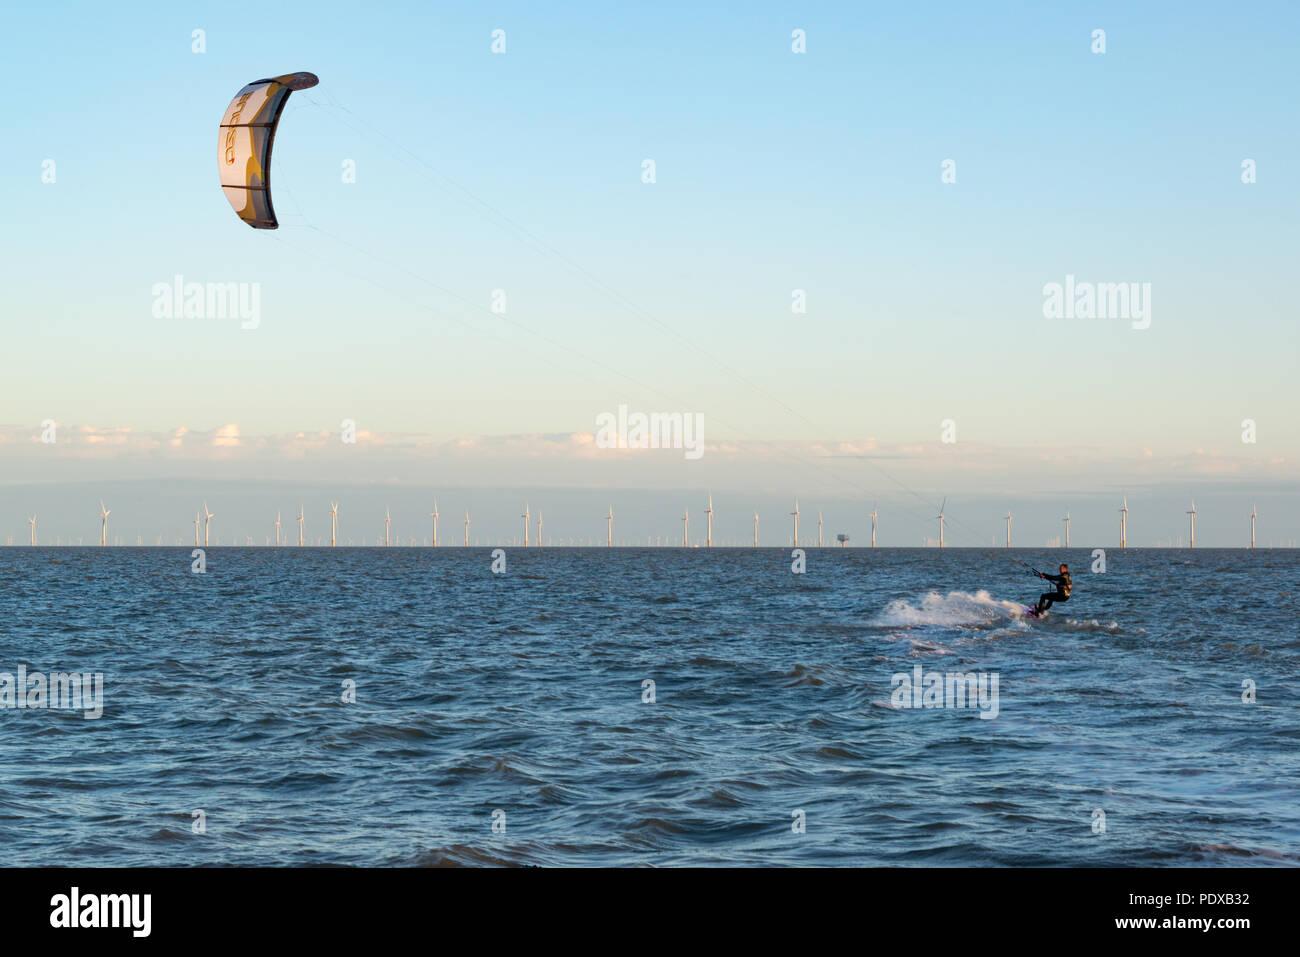 A kite surfer in the sea near Clacton-on-Sea, Essex - Stock Image